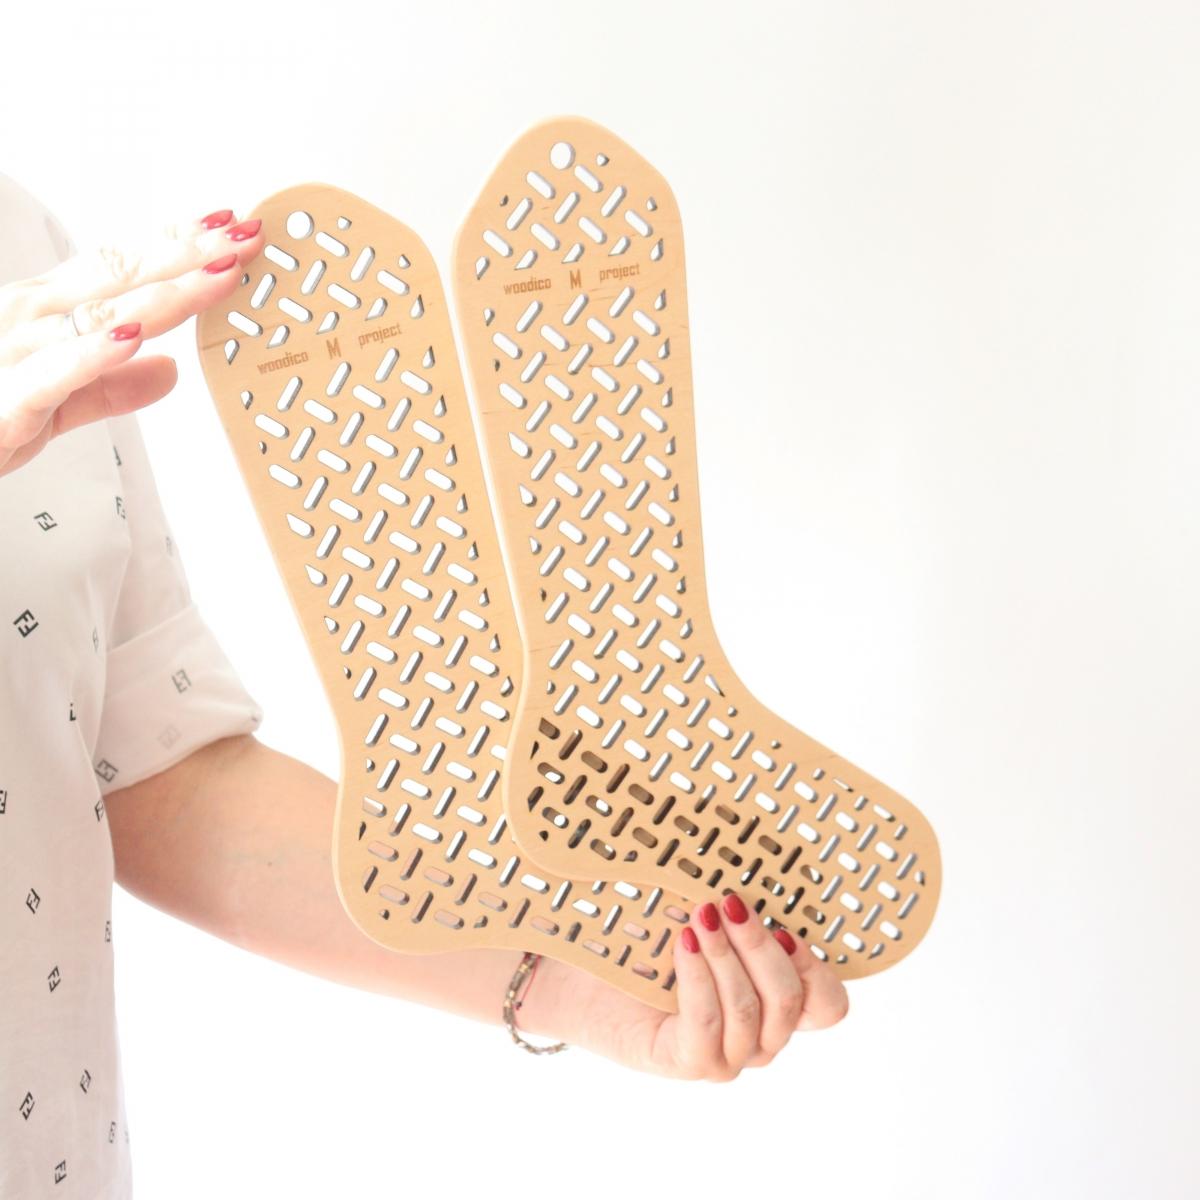 woodico.pro wooden sock blockers stitches 7 1200x1200 - Wooden sock blockers / Stitches